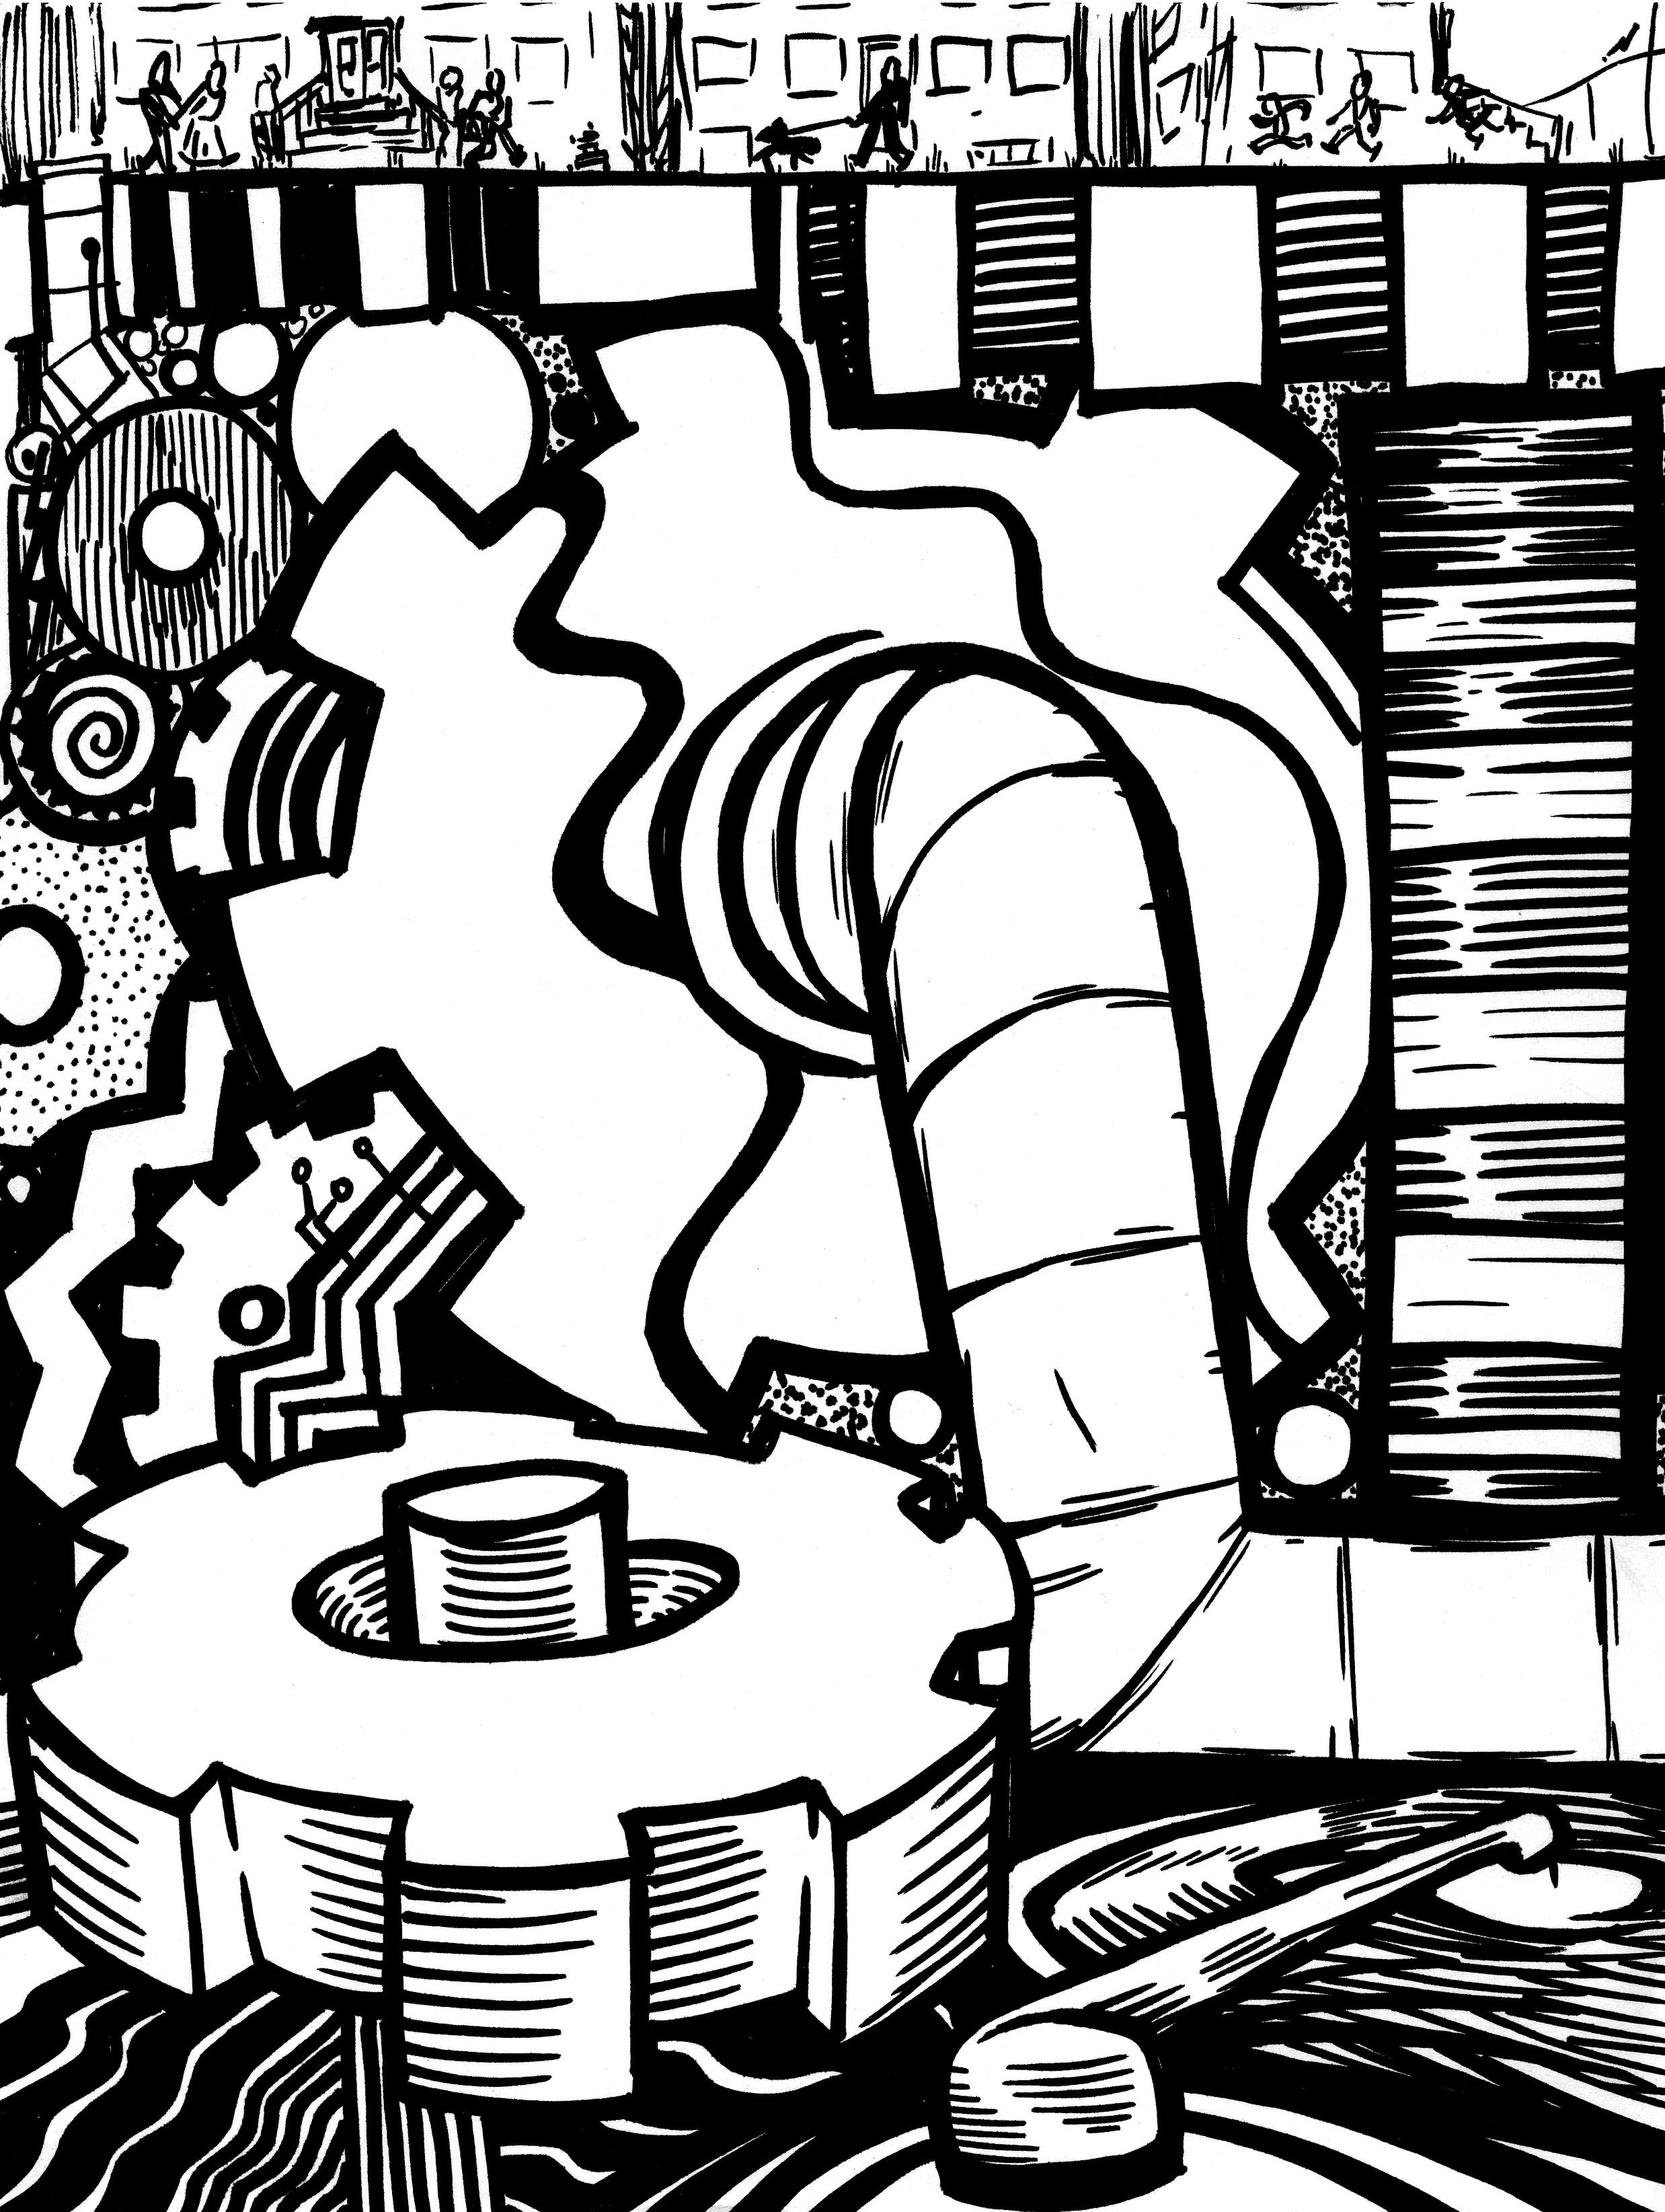 chicago-subterrainian-gears-WEB.jpg